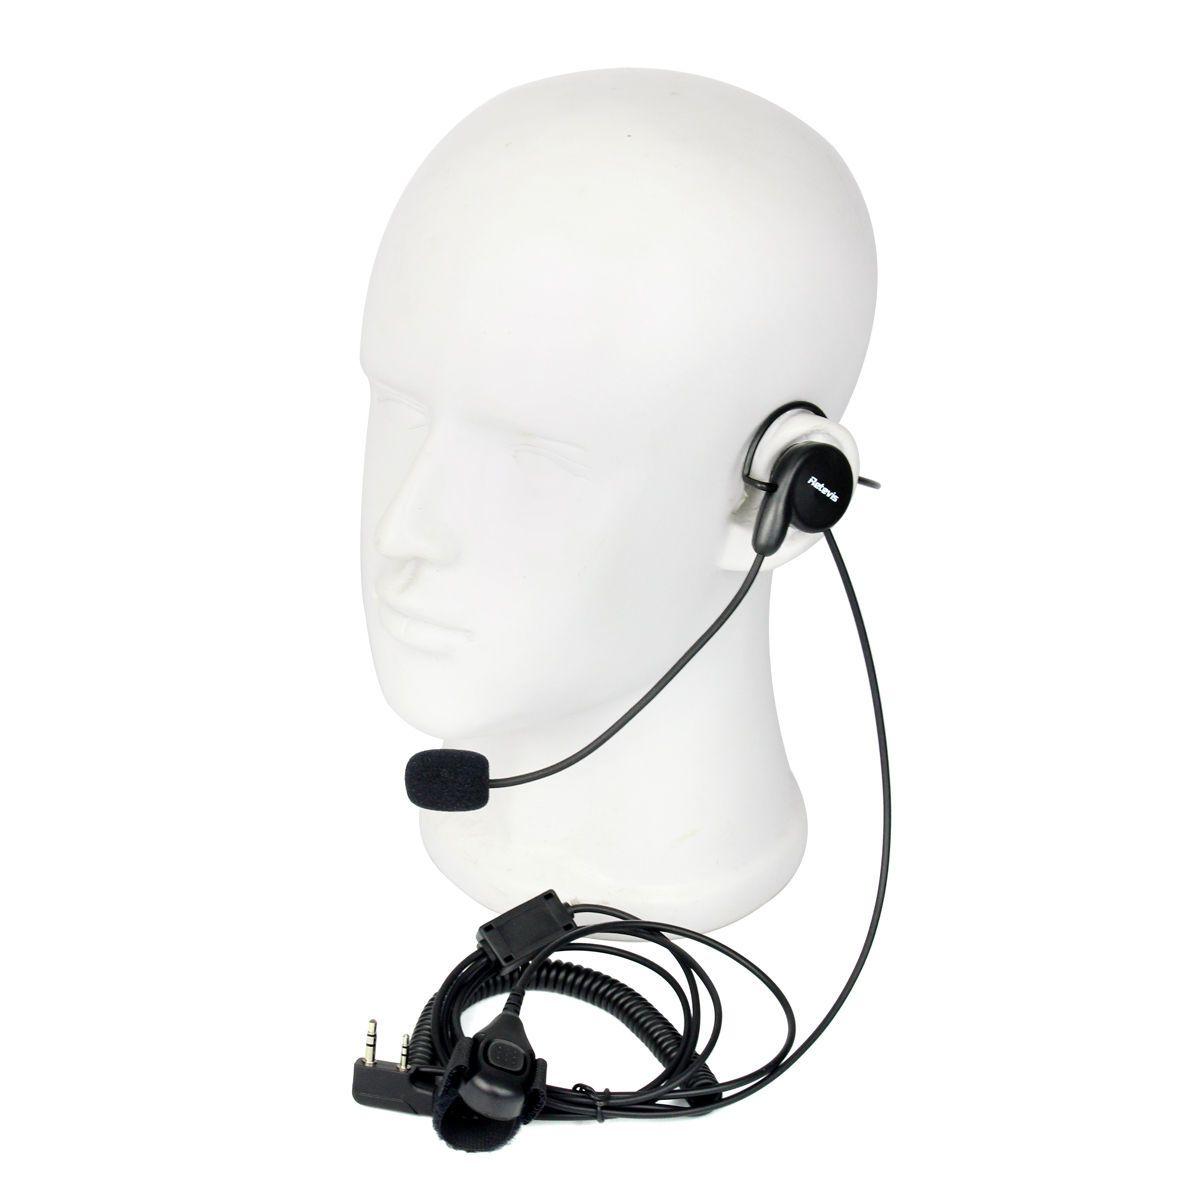 hight resolution of  new 2 pin earpiece mic finger ptt headset for kenwood baofeng wouxun wouxun microphone wiring diagram